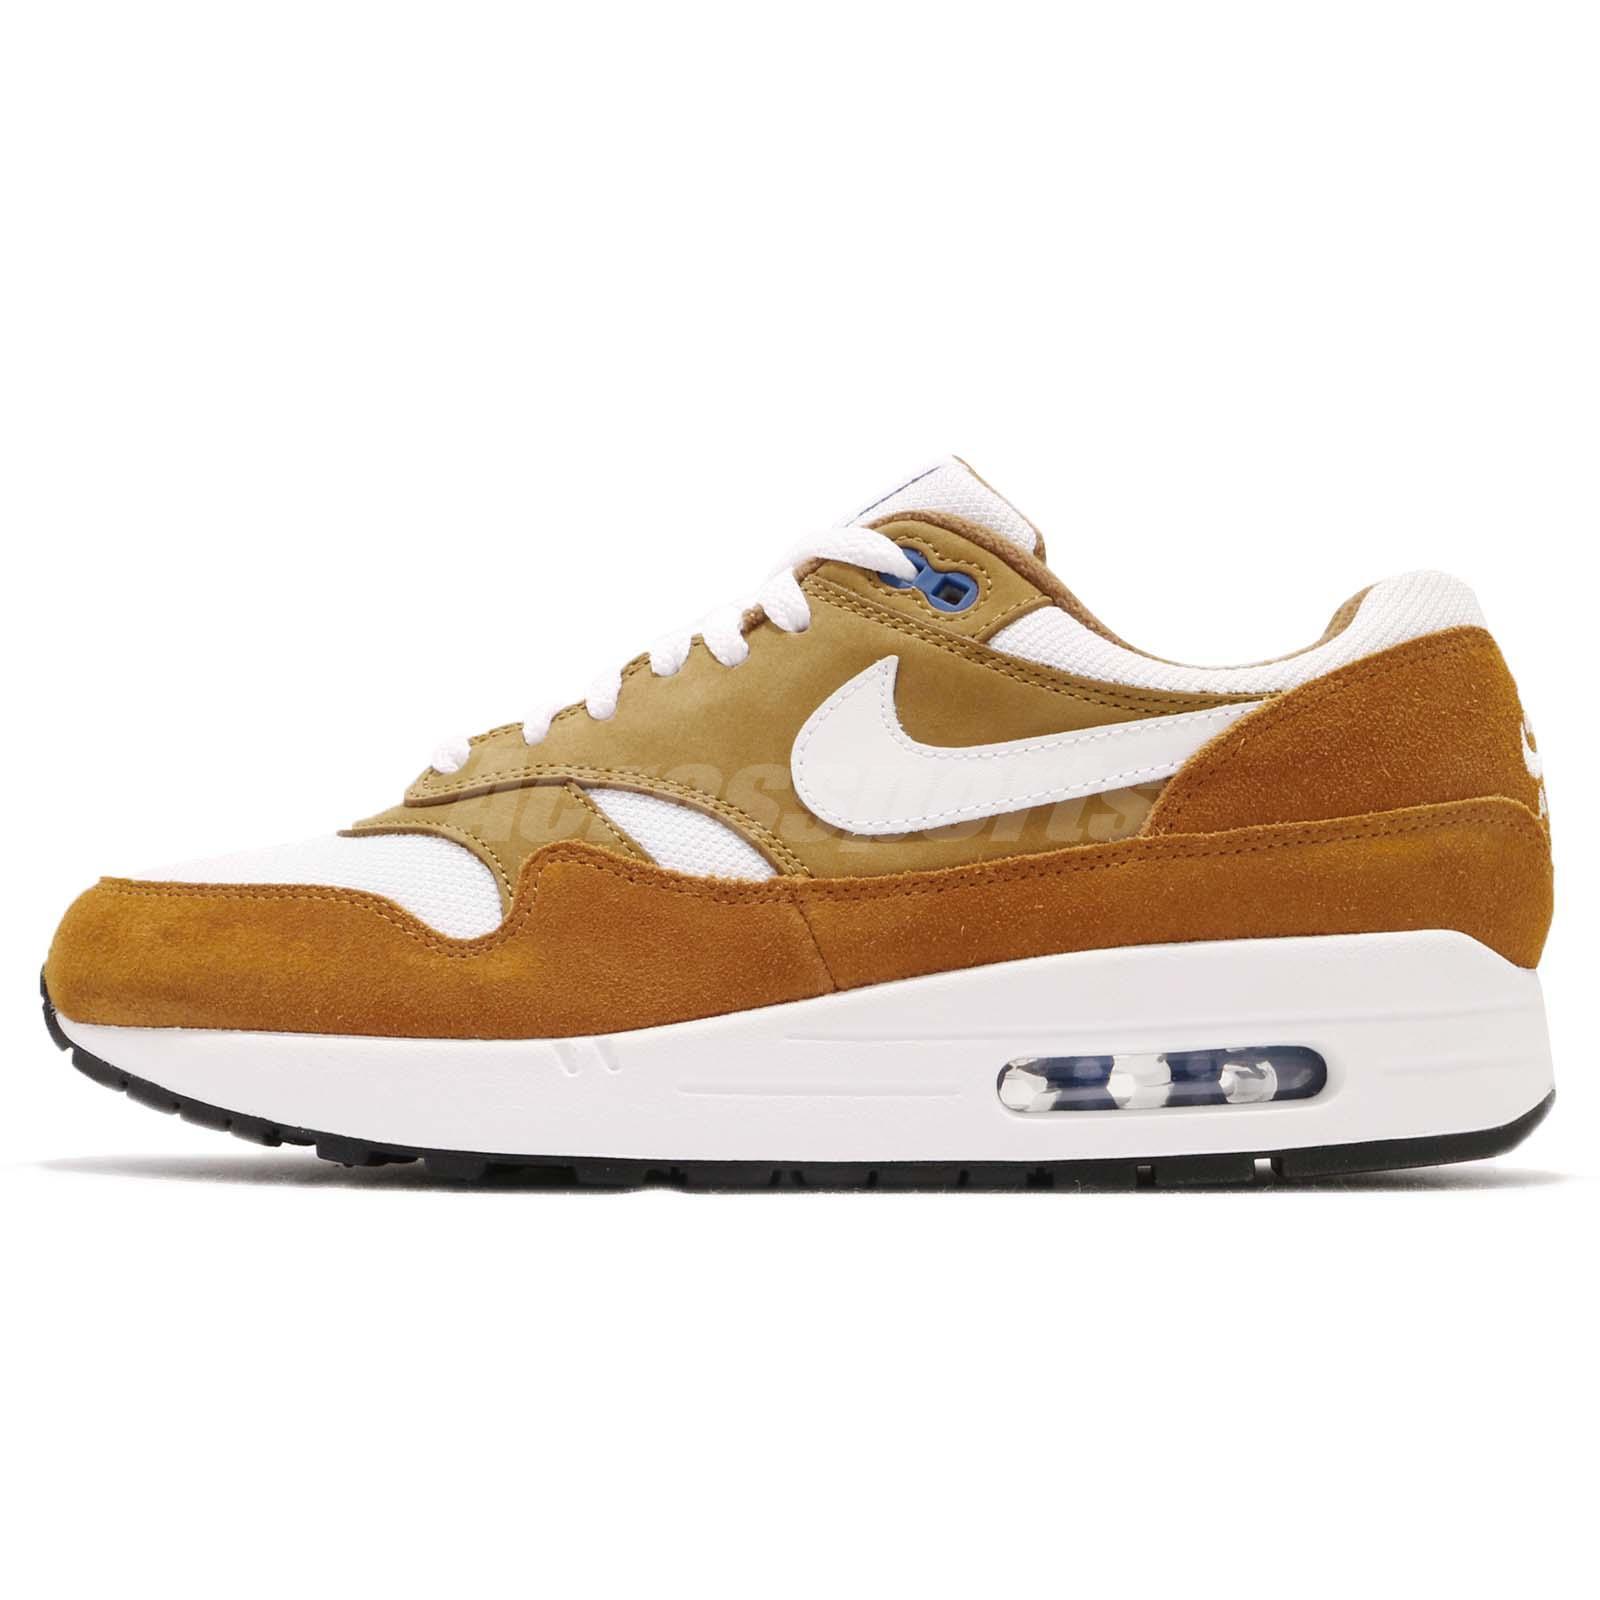 Details about Nike Air Max 1 Premium Retro I Atmos Dark Curry Men Running Shoes 908366 700